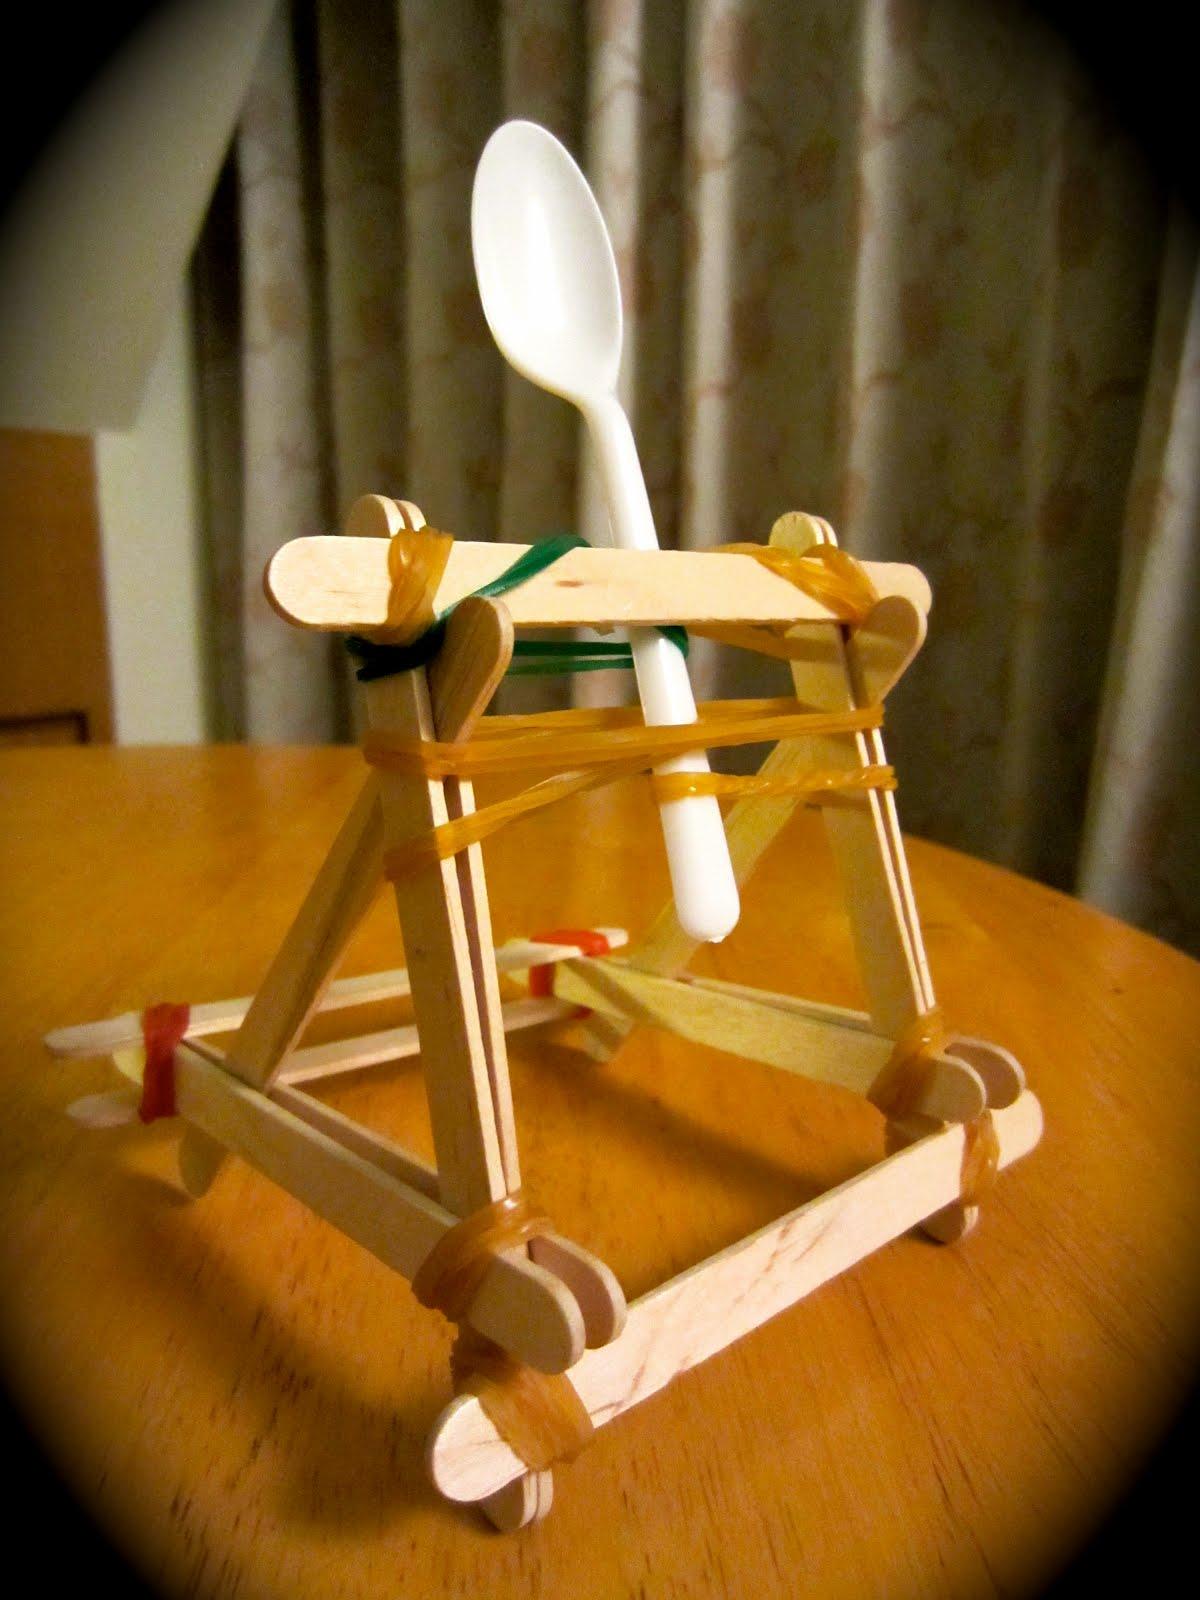 The gallery for --> Popsicle Stick Trebuchet Designs   1200 x 1600 jpeg 146kB